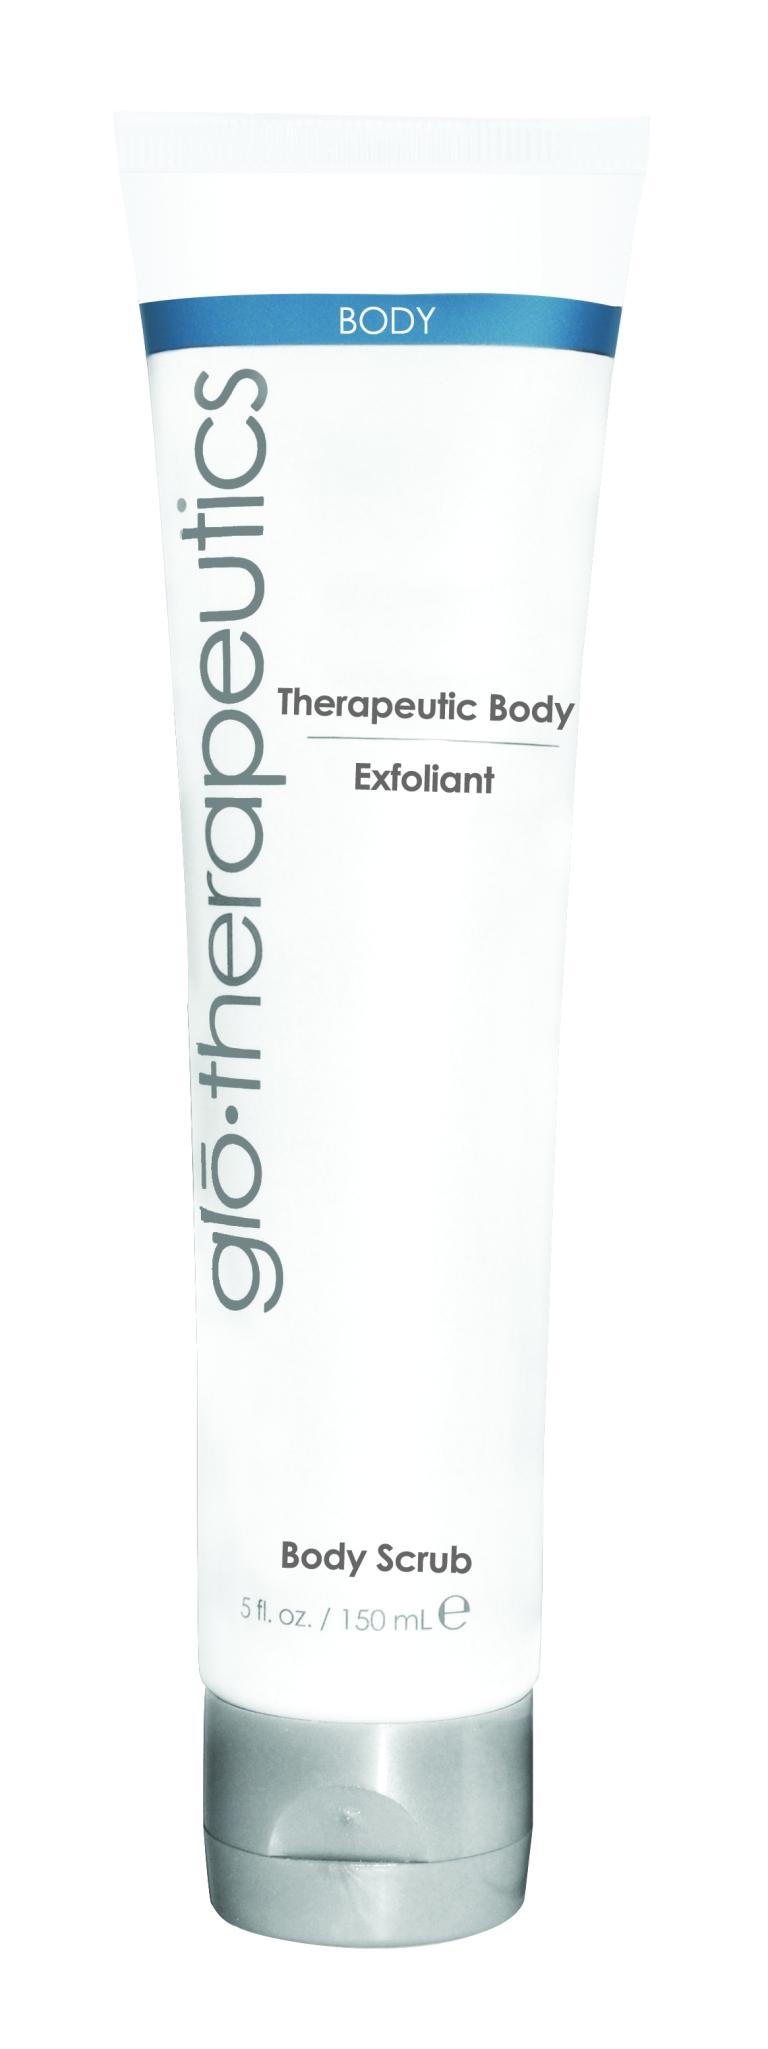 Therapeutics Body Exfoliant